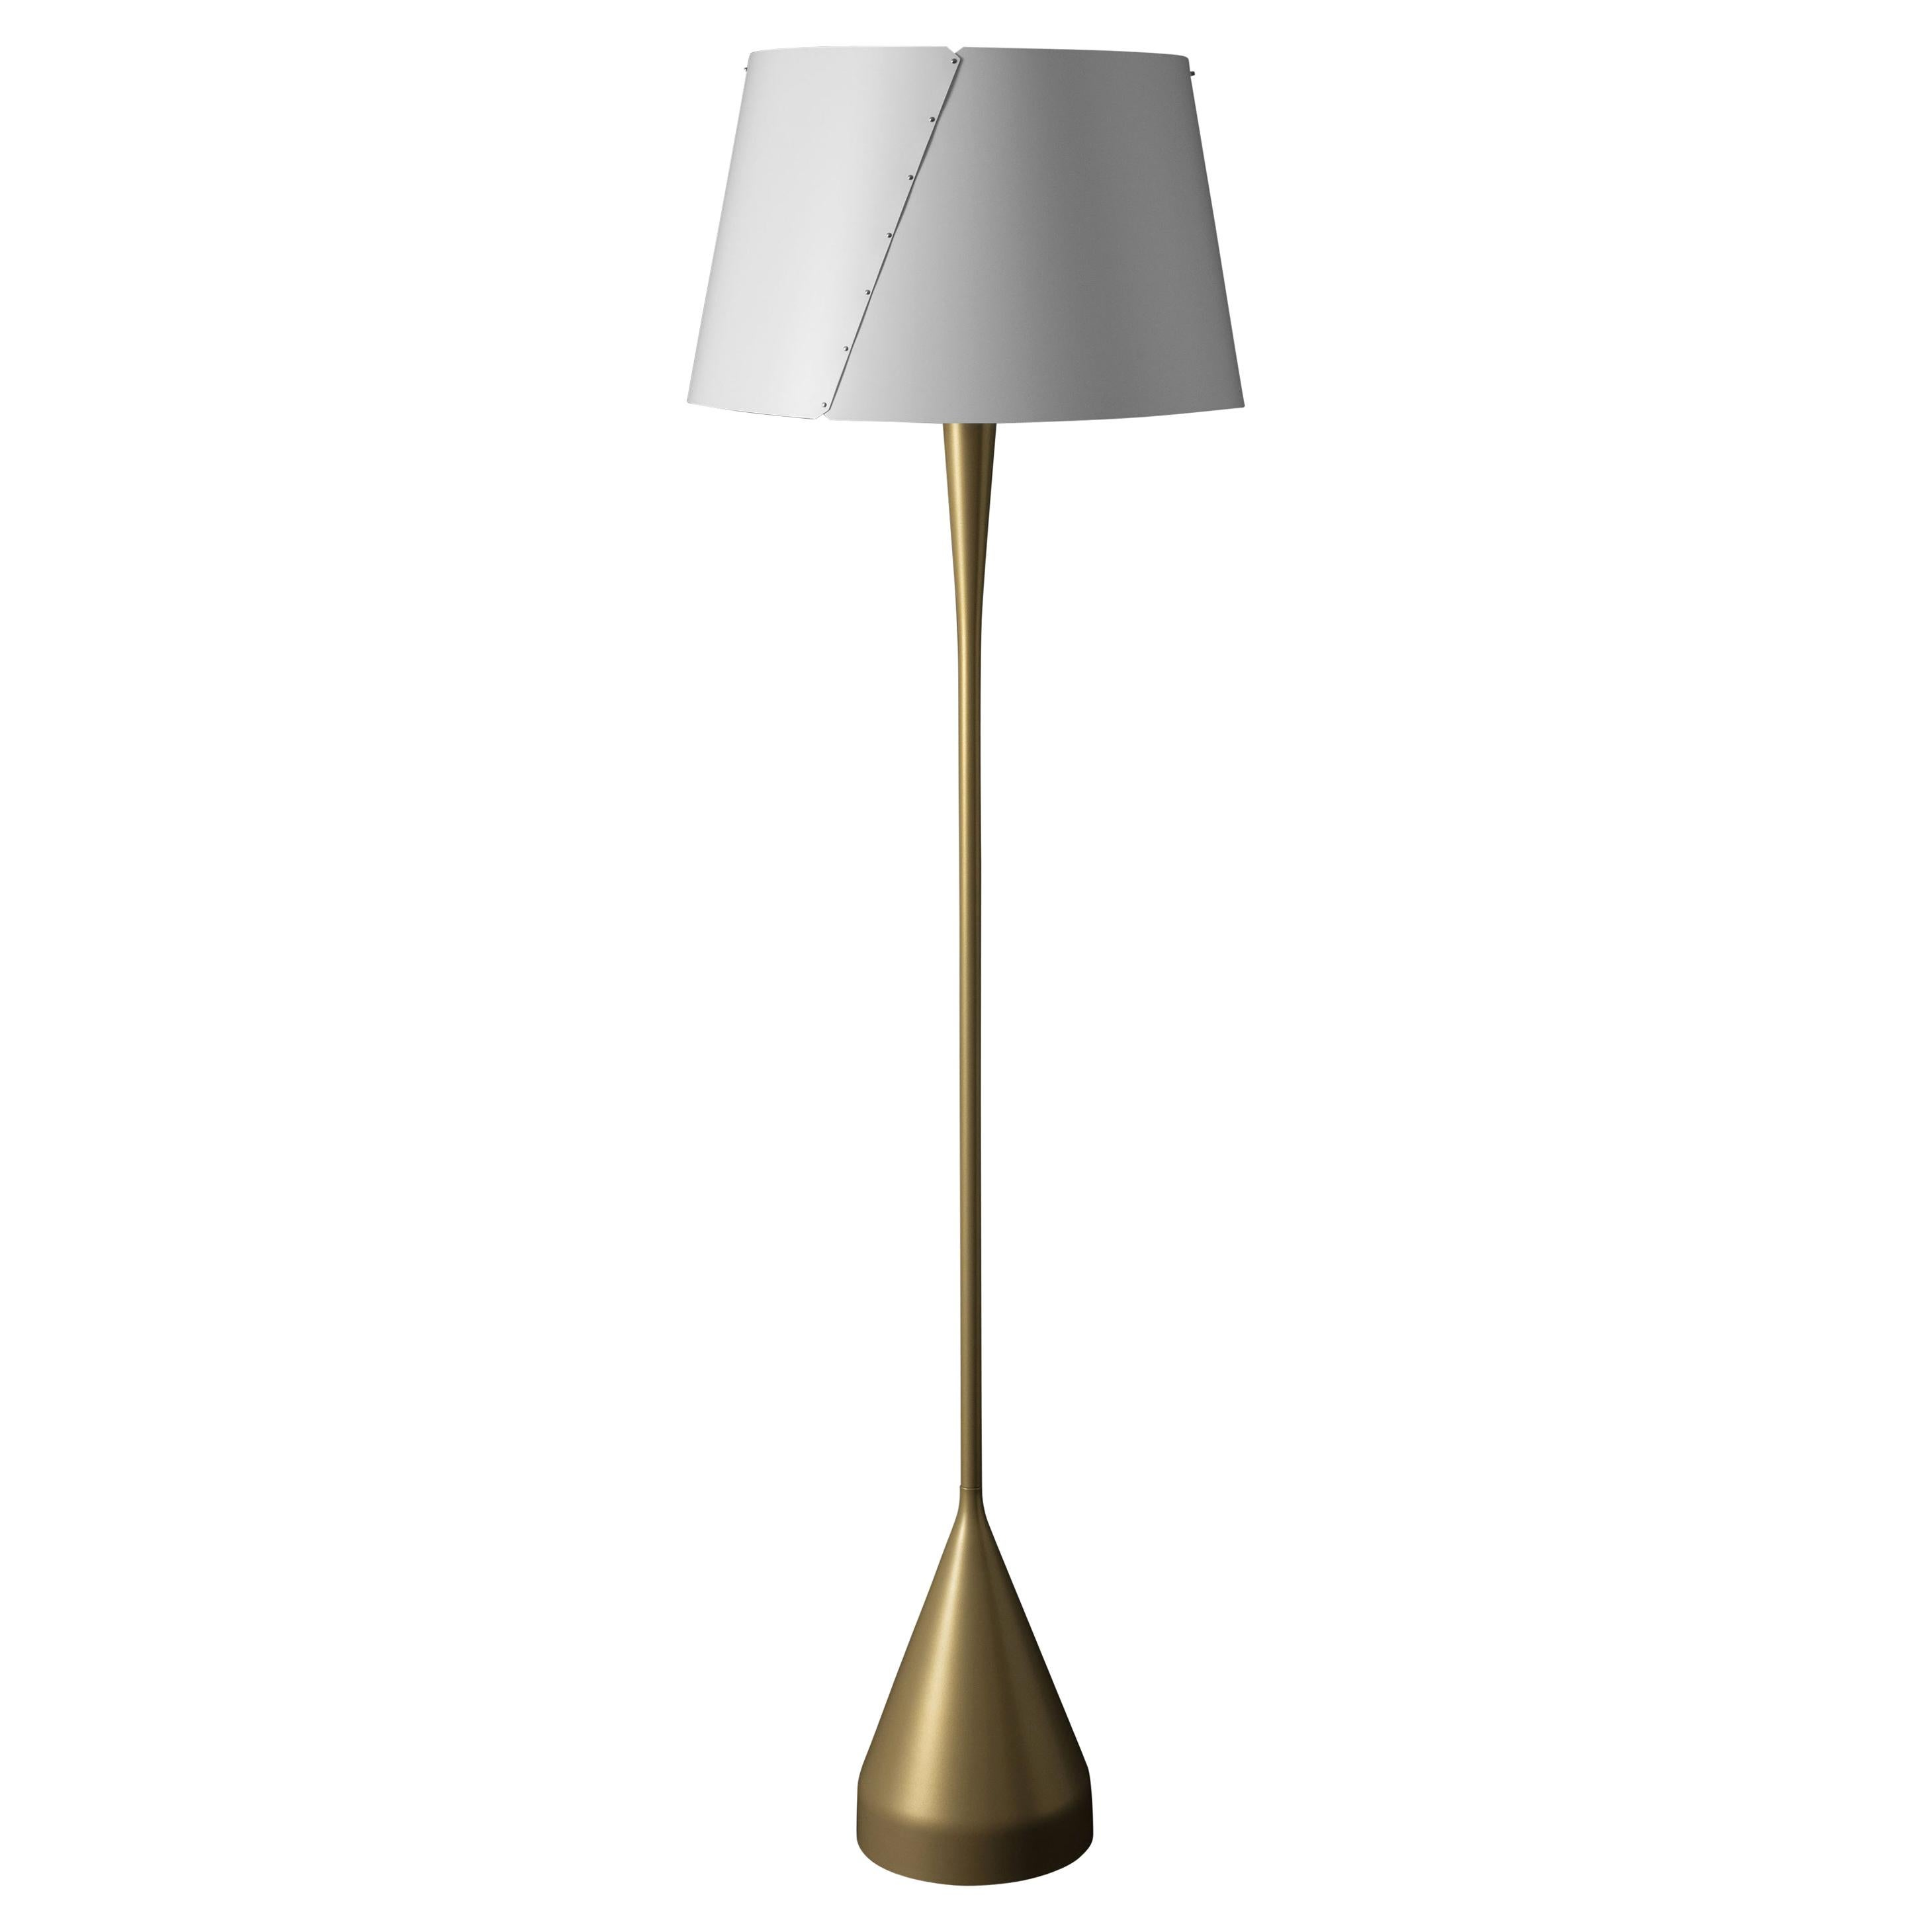 Gio Ponti De-Lux A4 Floor Lamp in Gold